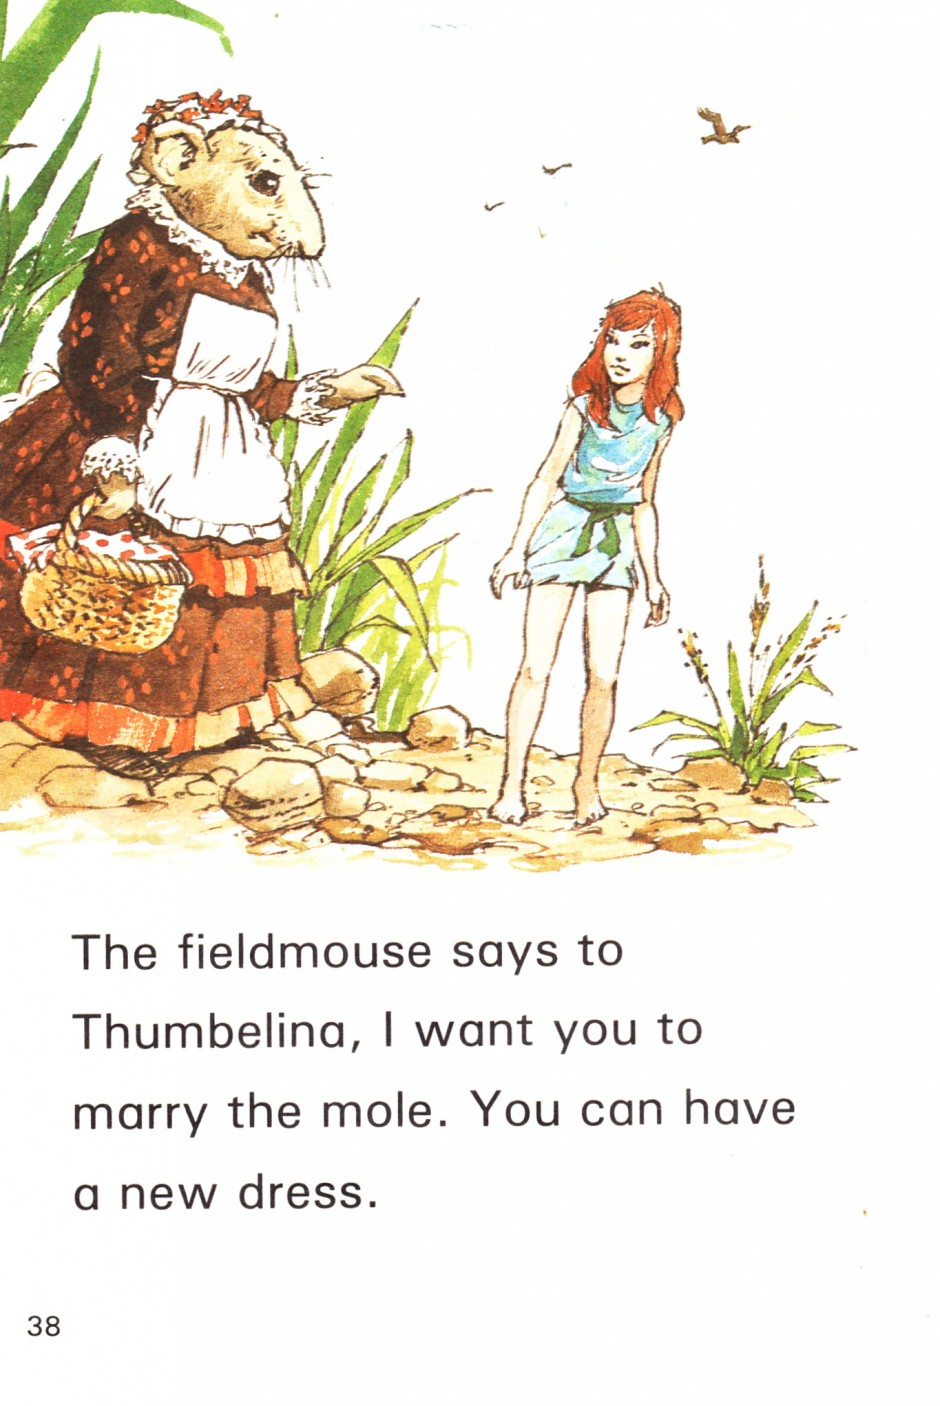 Book report of thumbelina